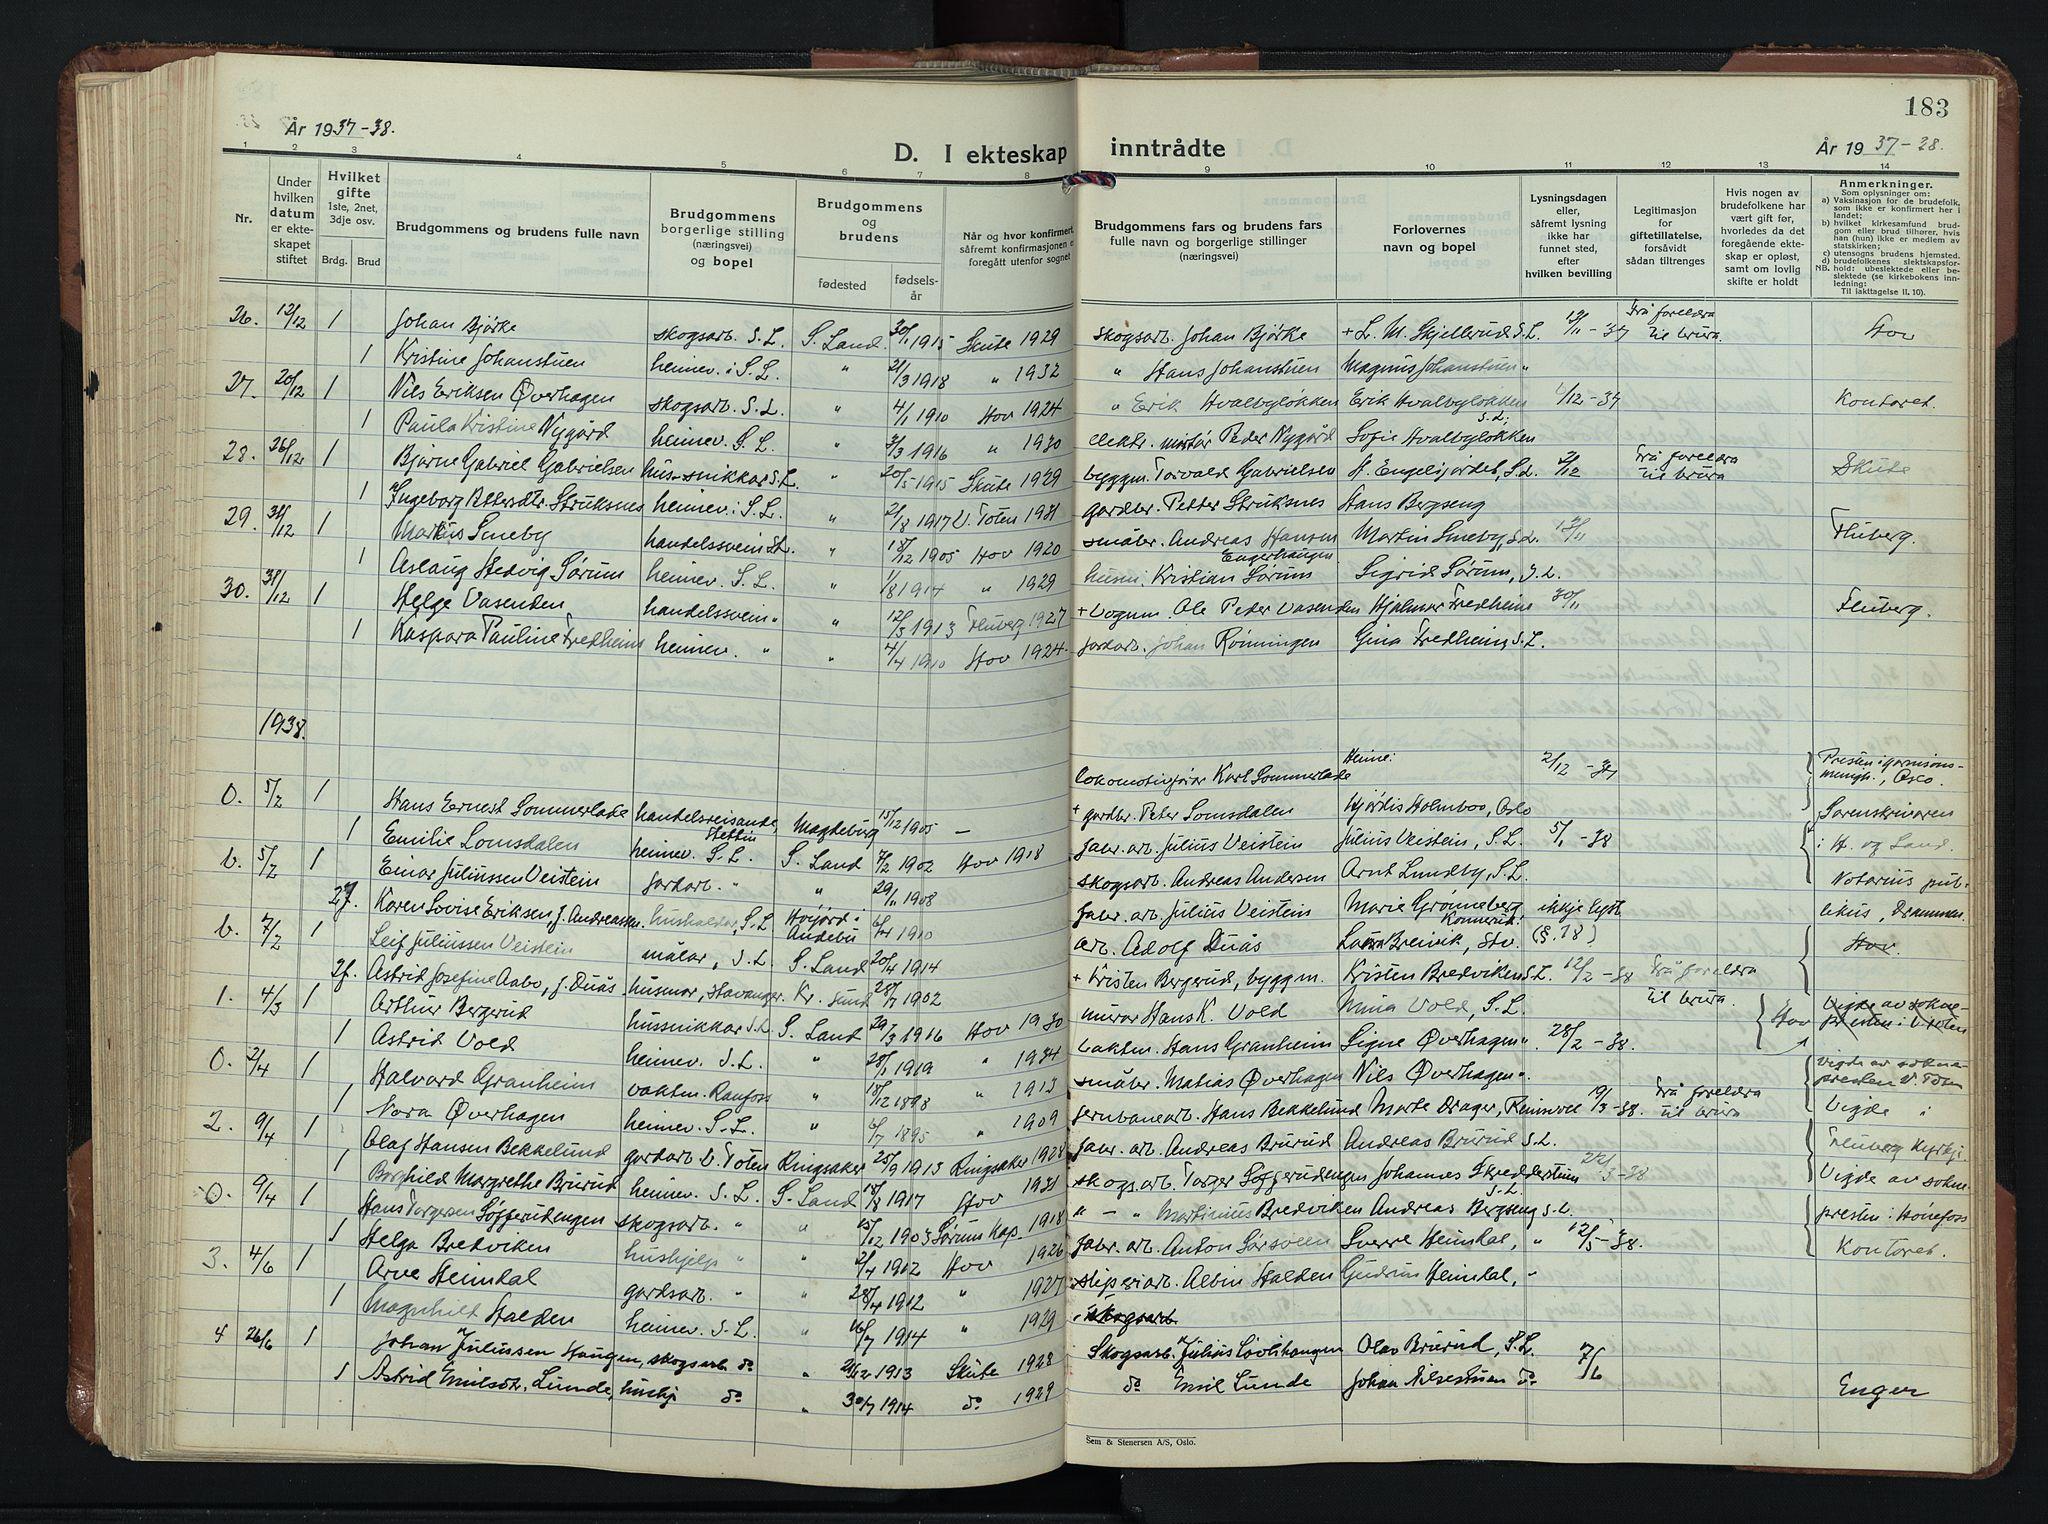 SAH, Søndre Land prestekontor, L/L0009: Klokkerbok nr. 9, 1933-1954, s. 183